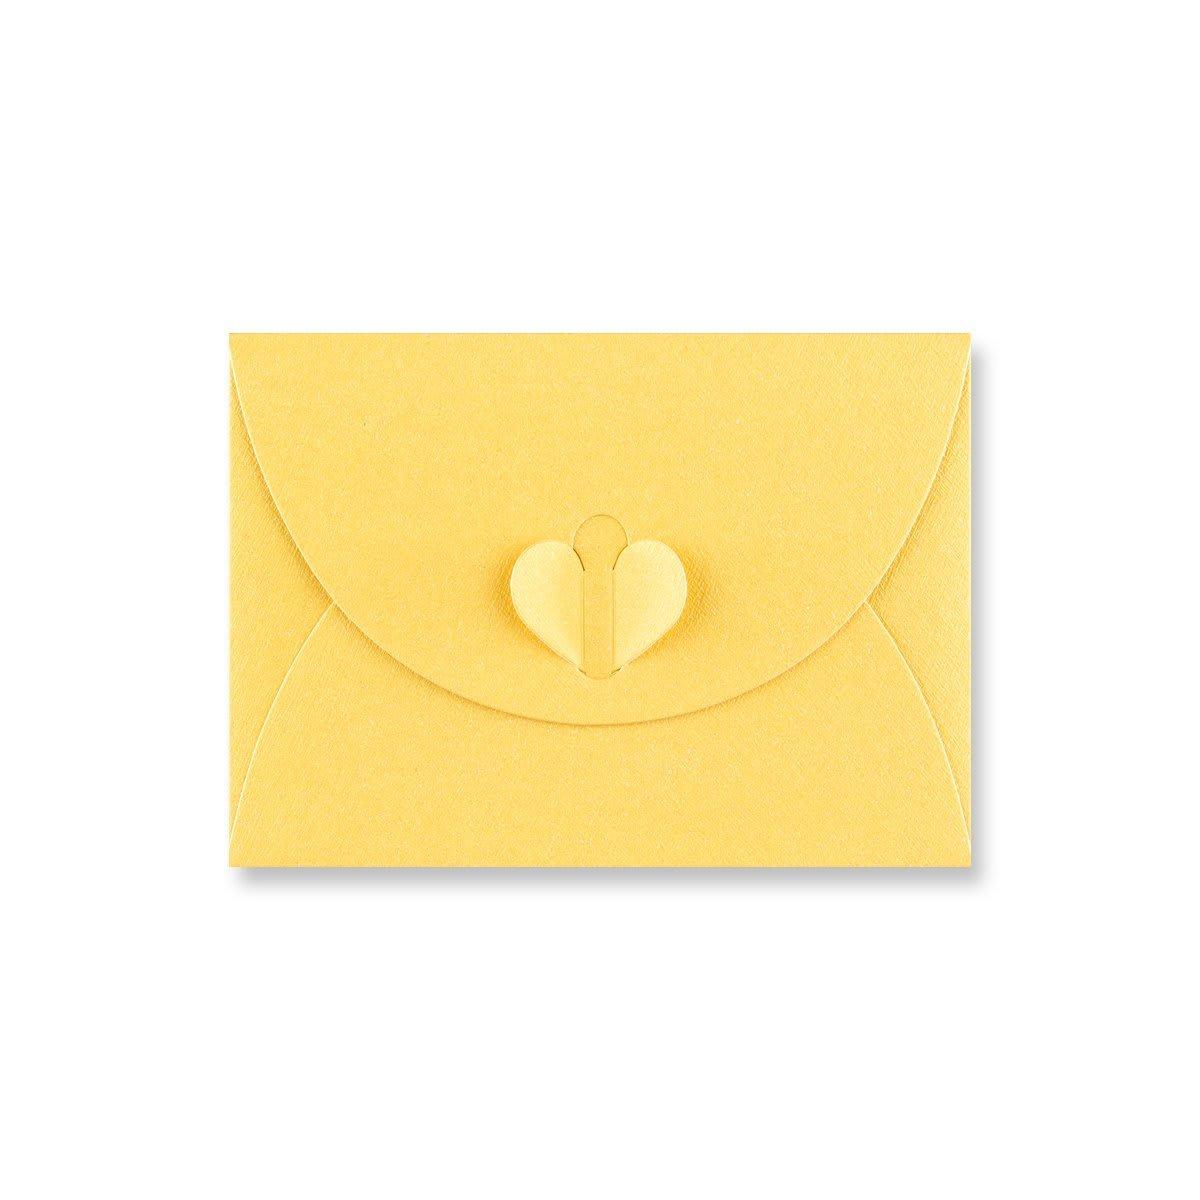 C7 GOLDEN YELLOW BUTTERFLY ENVELOPES